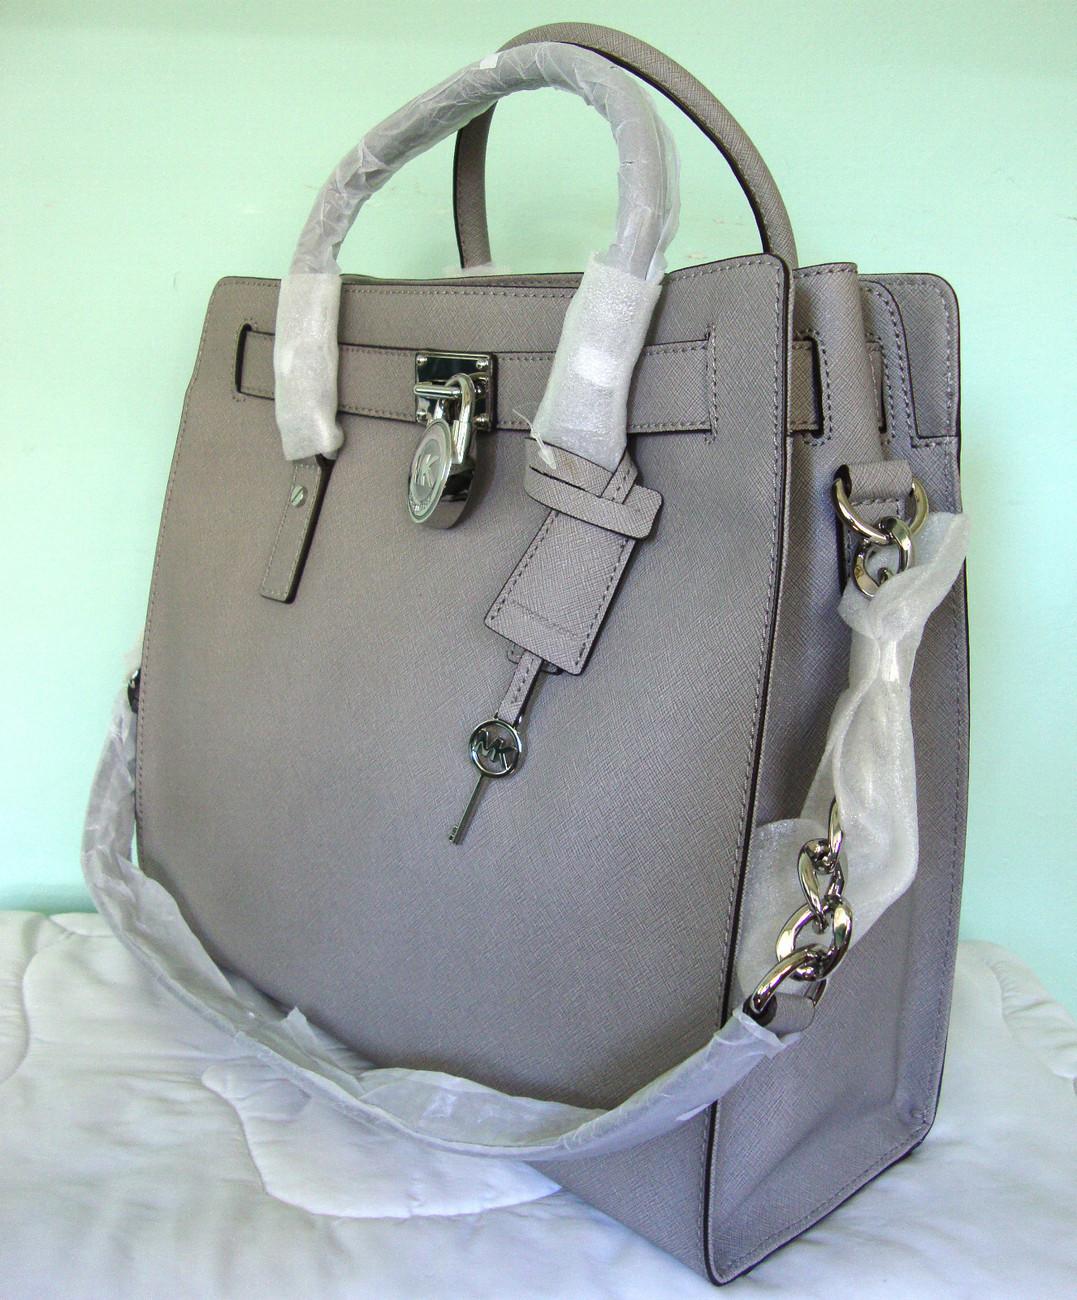 NWT MICHAEL KORS Hamilton SAFFIANO LEATHER PEARL GREY LG Gray Tote Handbag  AUTH